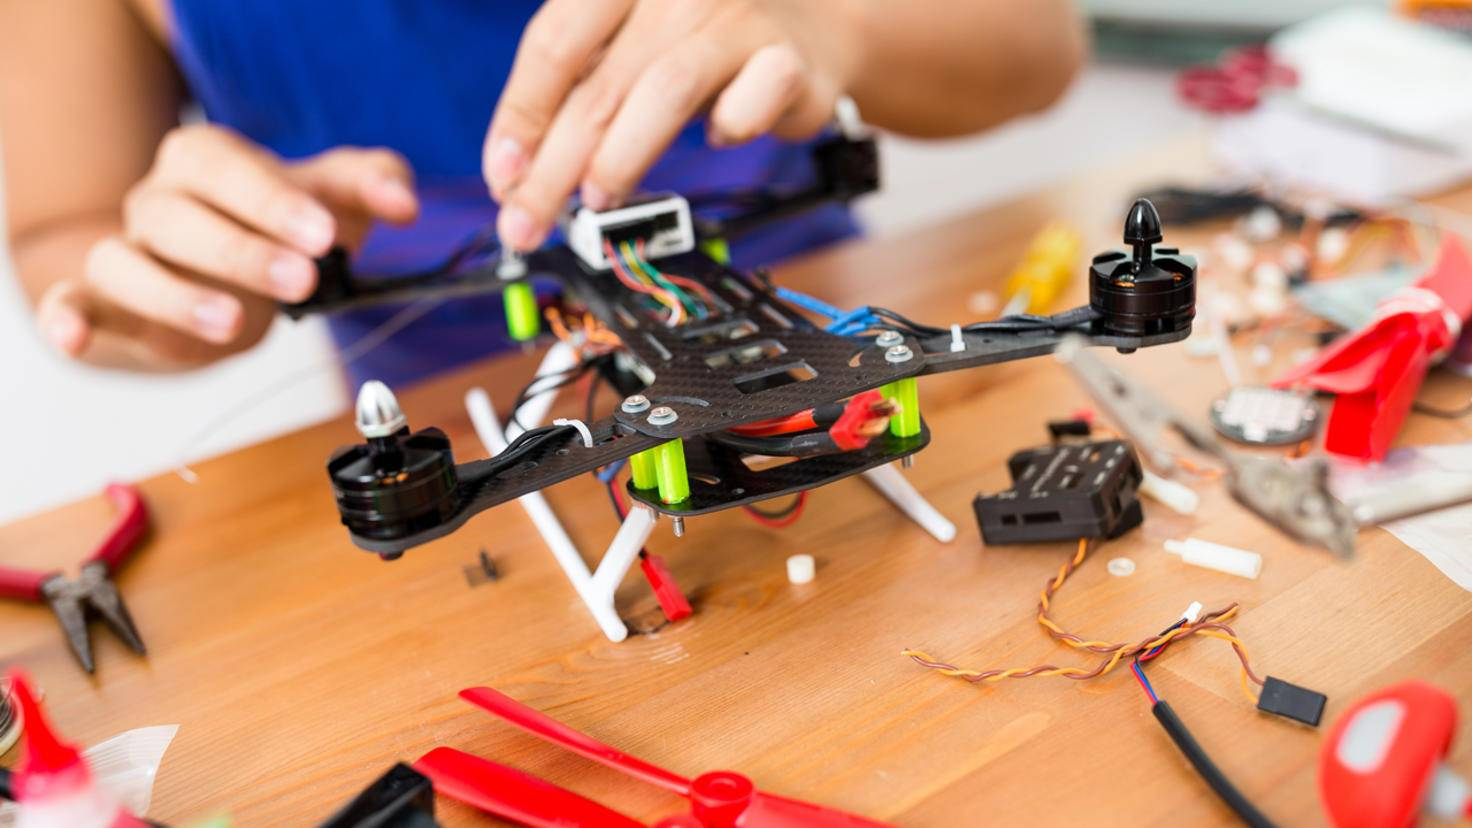 Drohne selber bauen 1